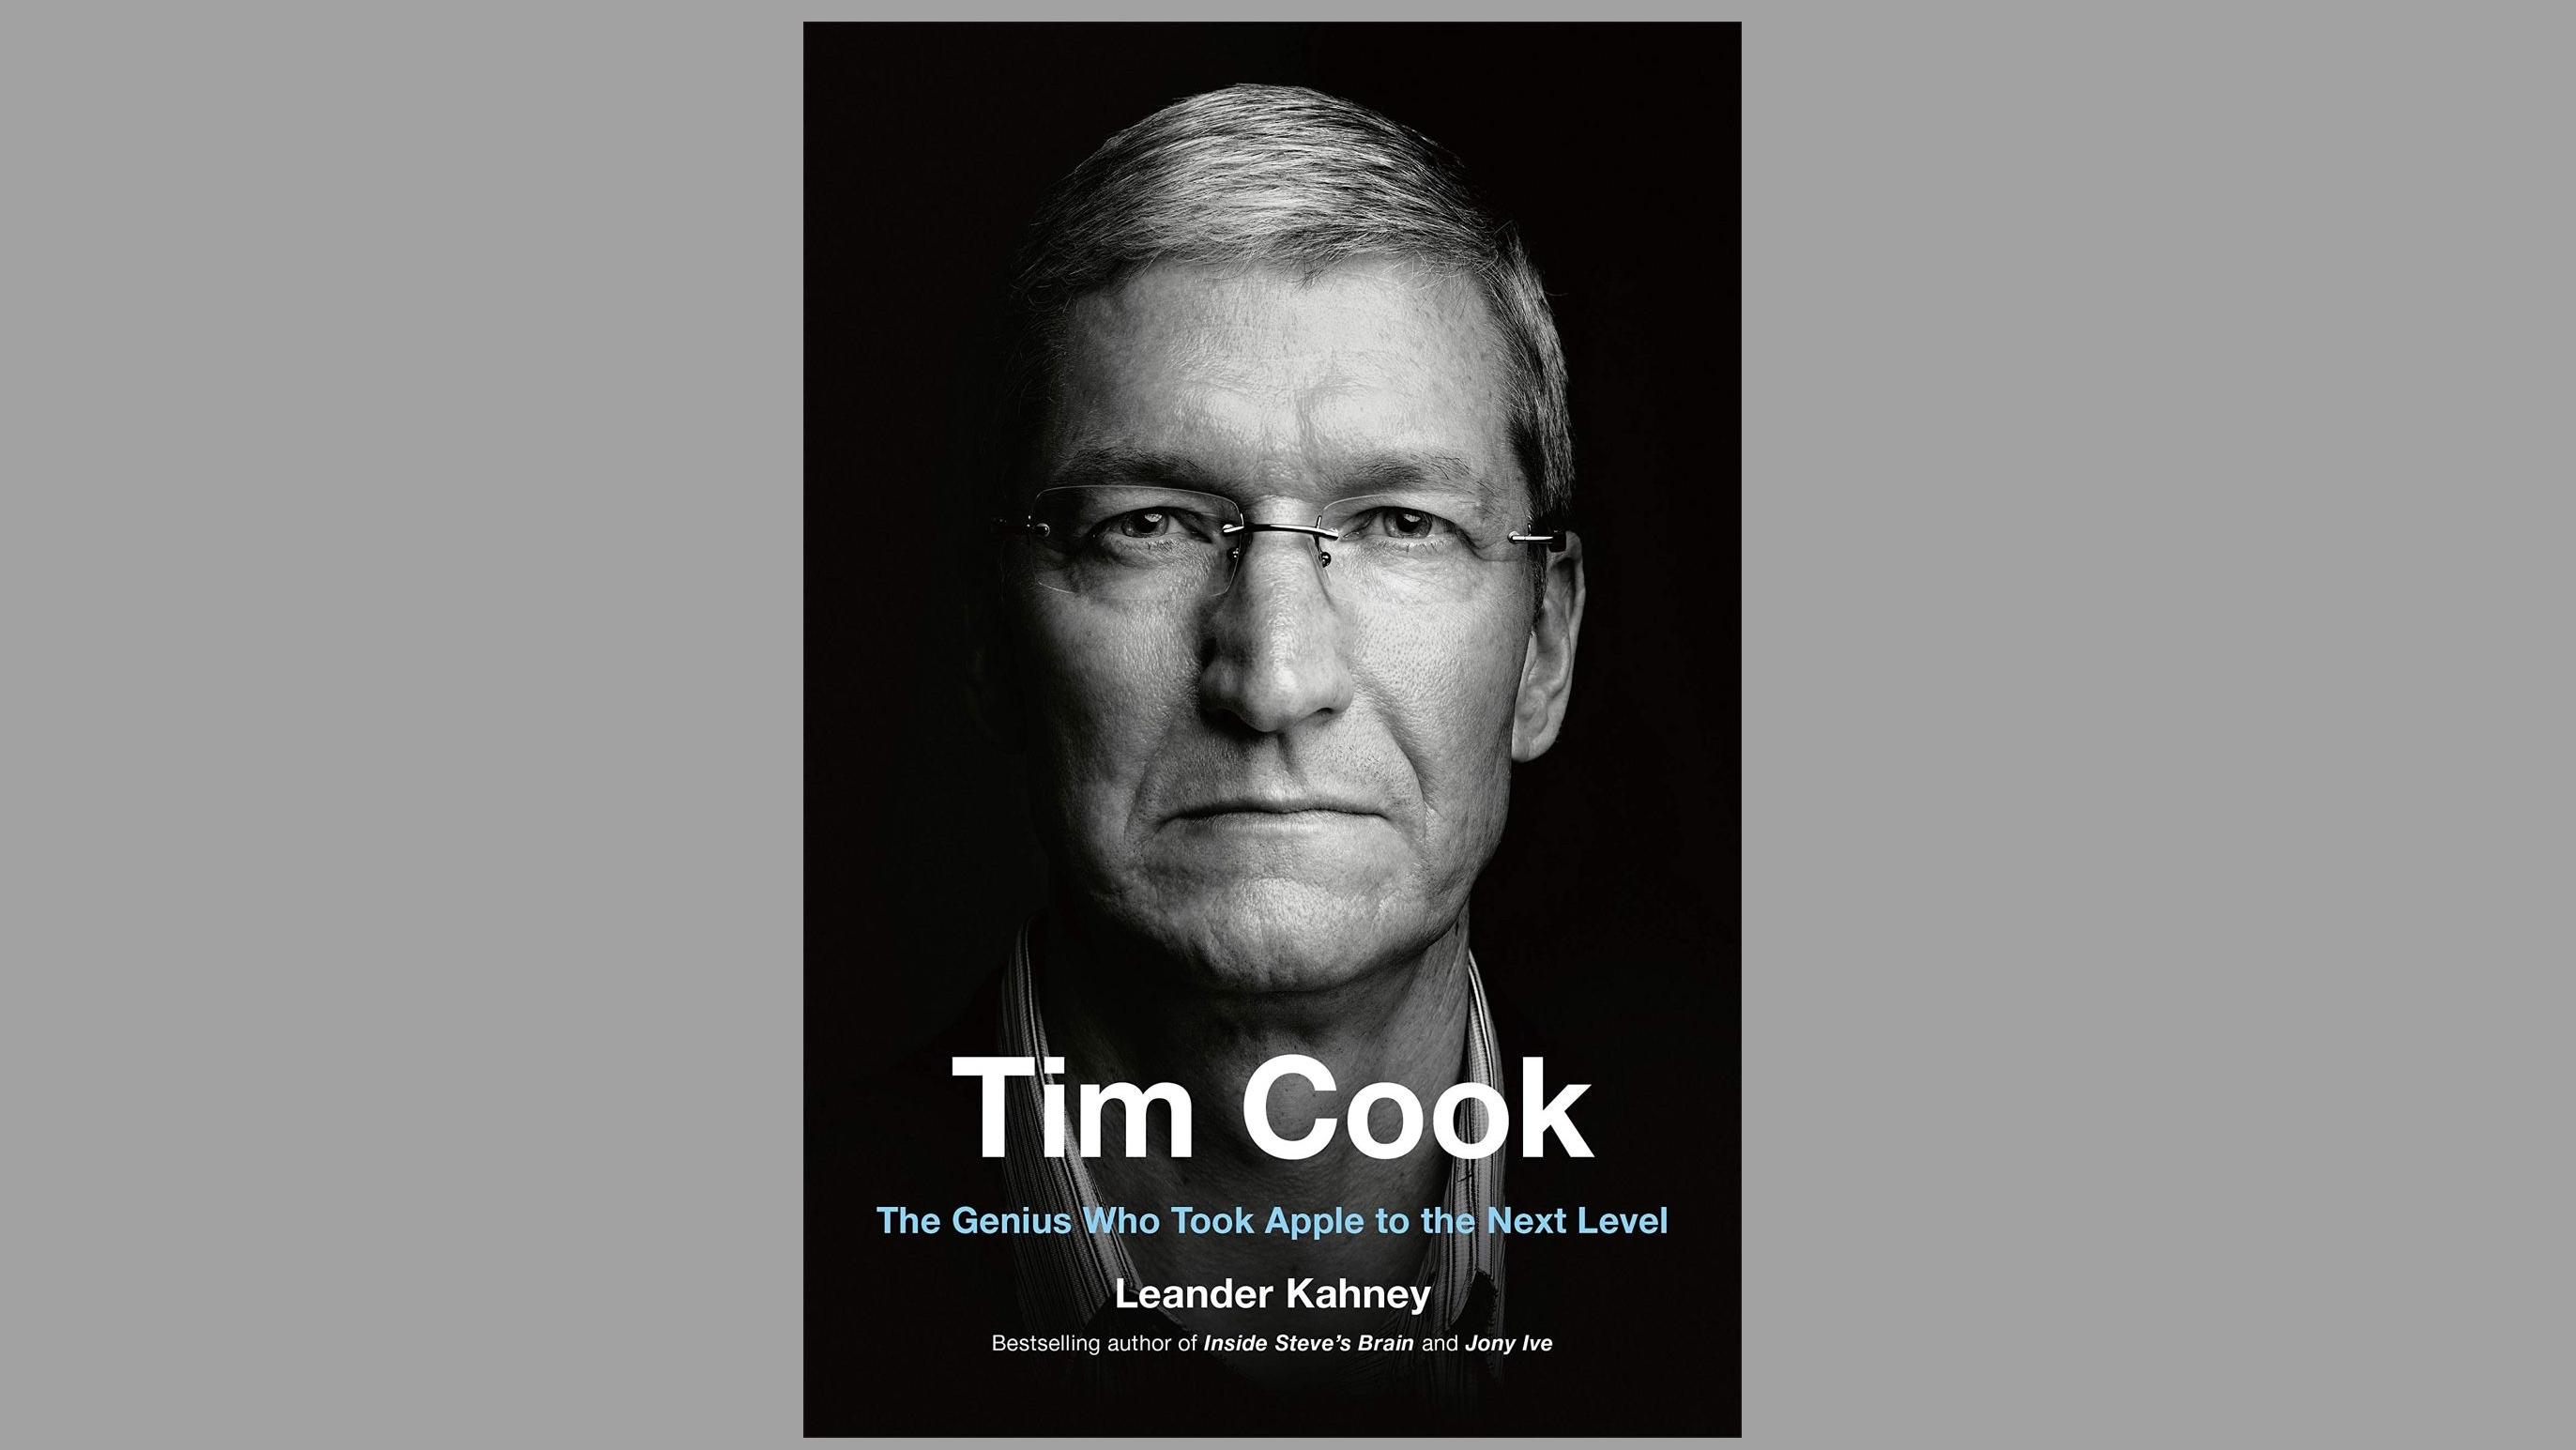 Tim Cook biografie